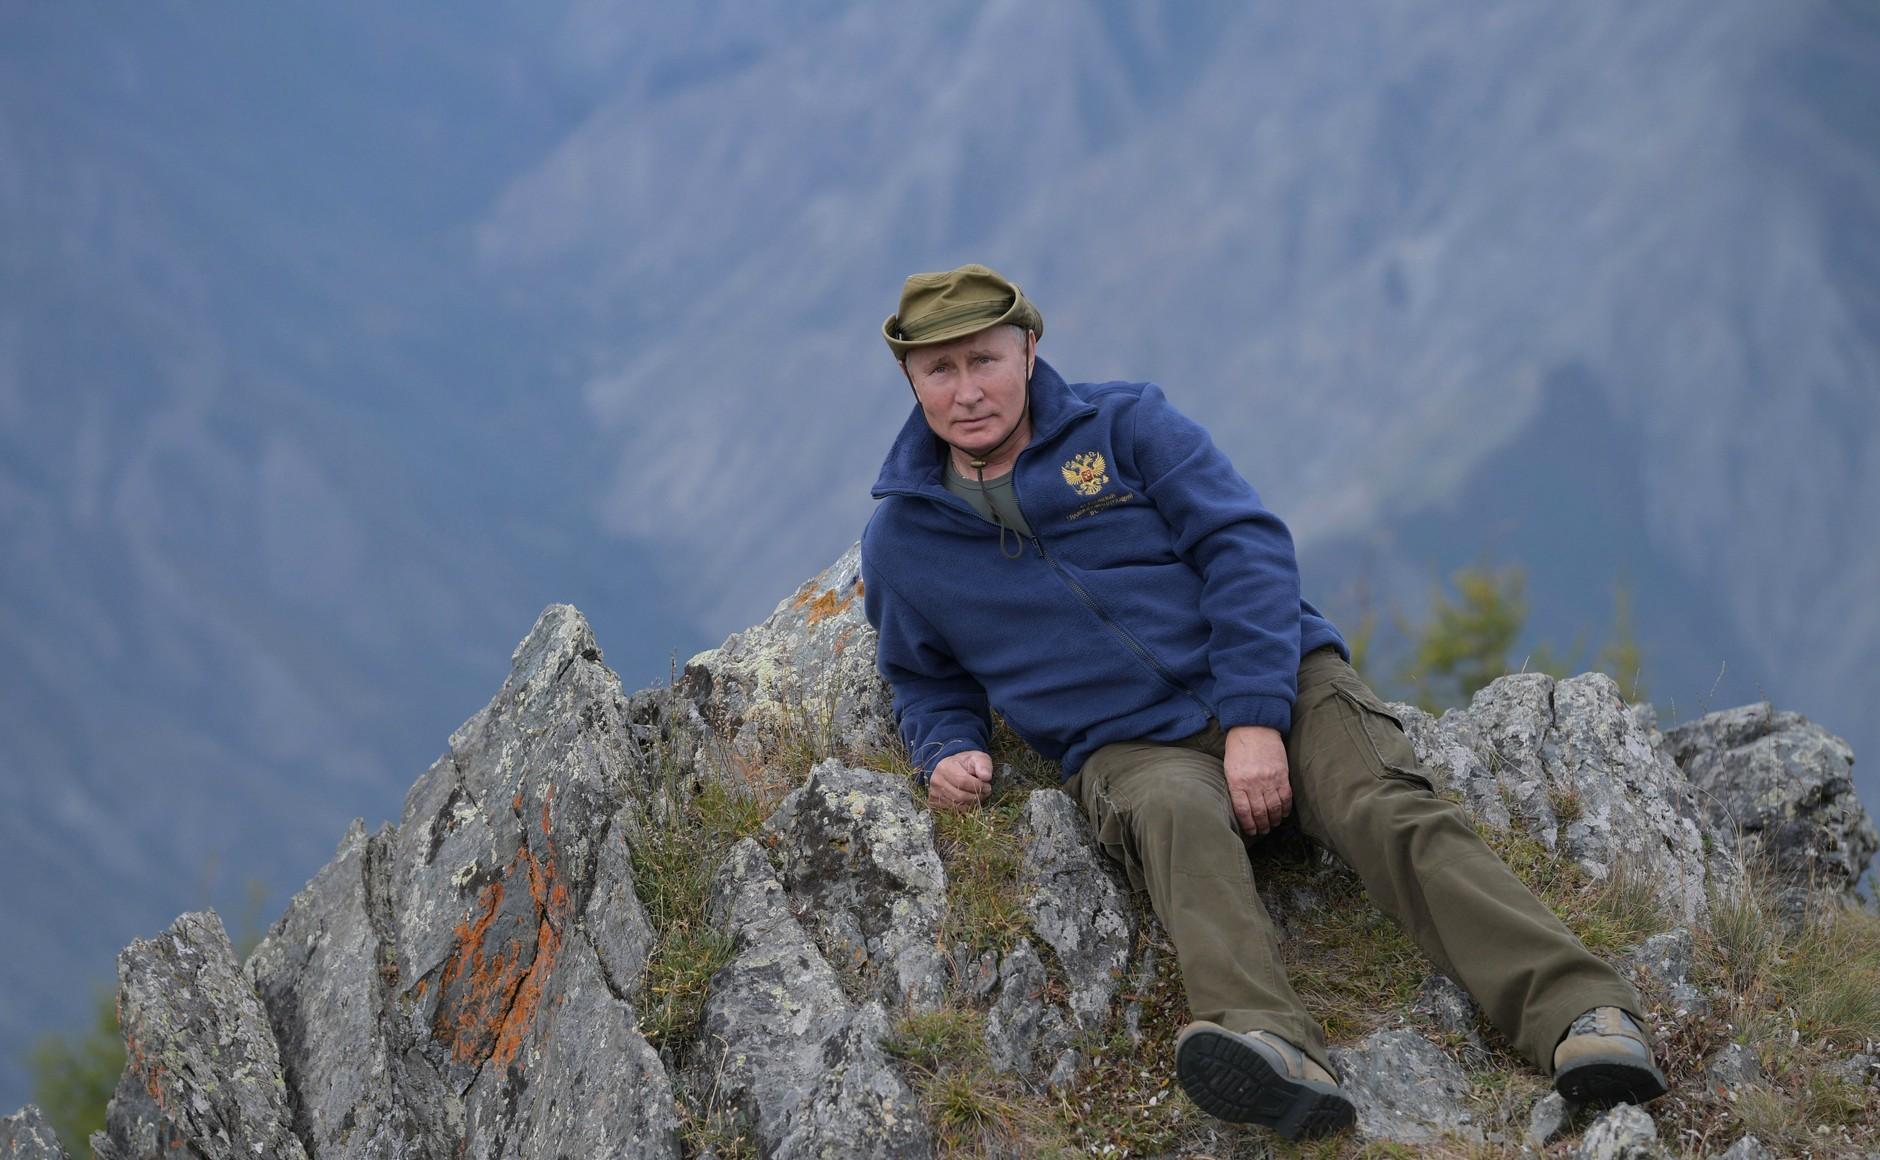 "<p>Президент России Владимир Путин. Фото © <a href=""http://kremlin.ru/events/president/news/61732/photos"" target=""_self"">Kremlin</a></p>"